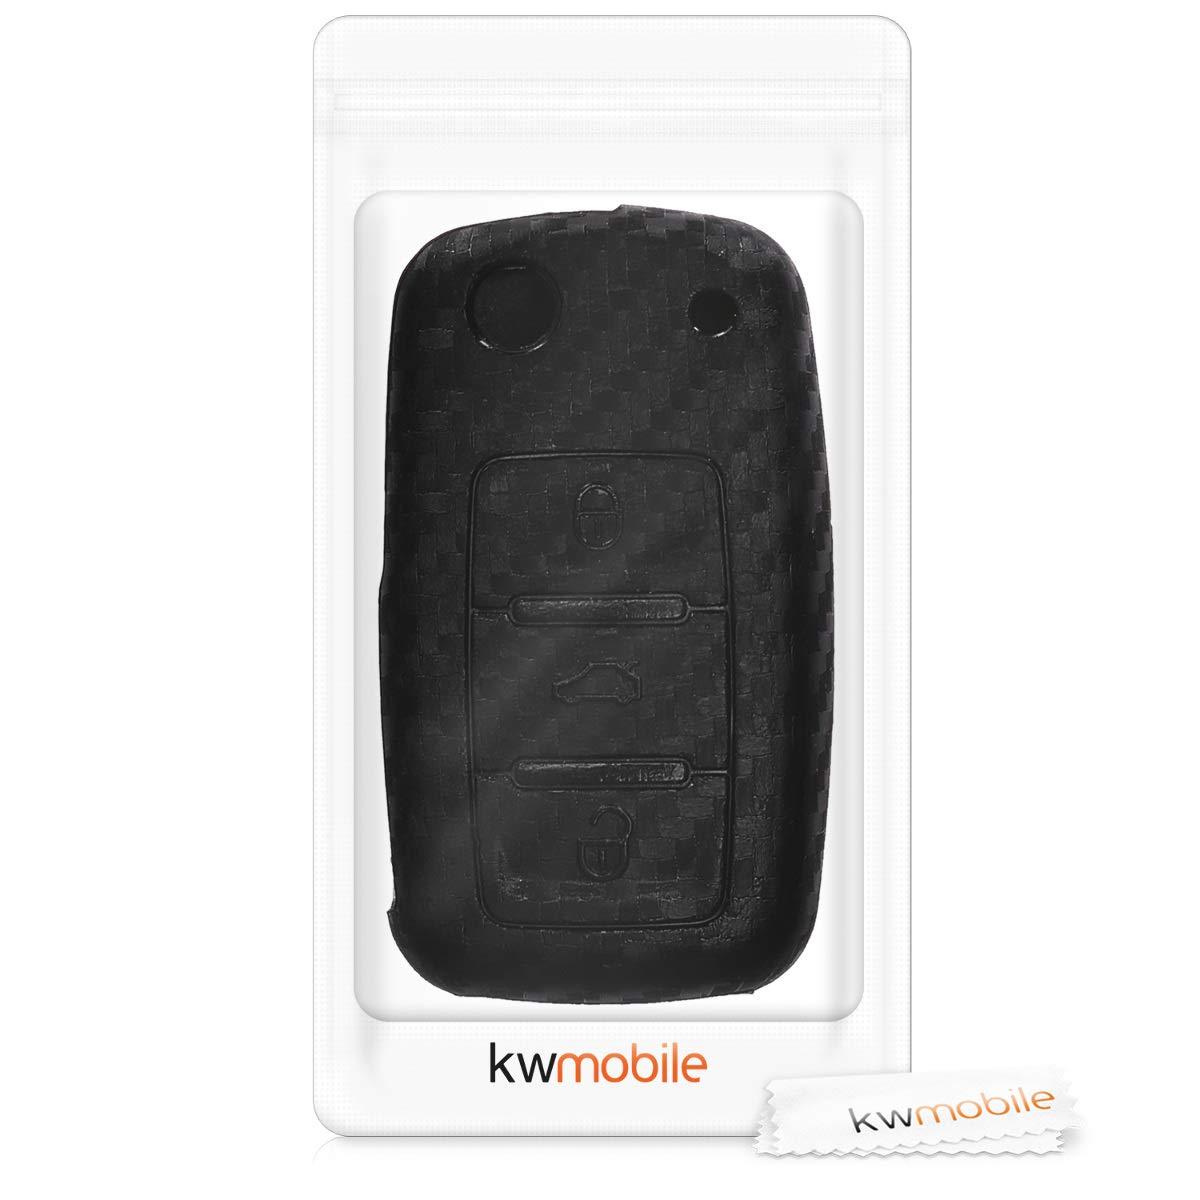 Suave kwmobile Funda de Silicona para Llave de 3 Botones para Coche VW Skoda Seat Blanco//Rojo Carcasa Protectora - Case Mando de Auto Silicona de